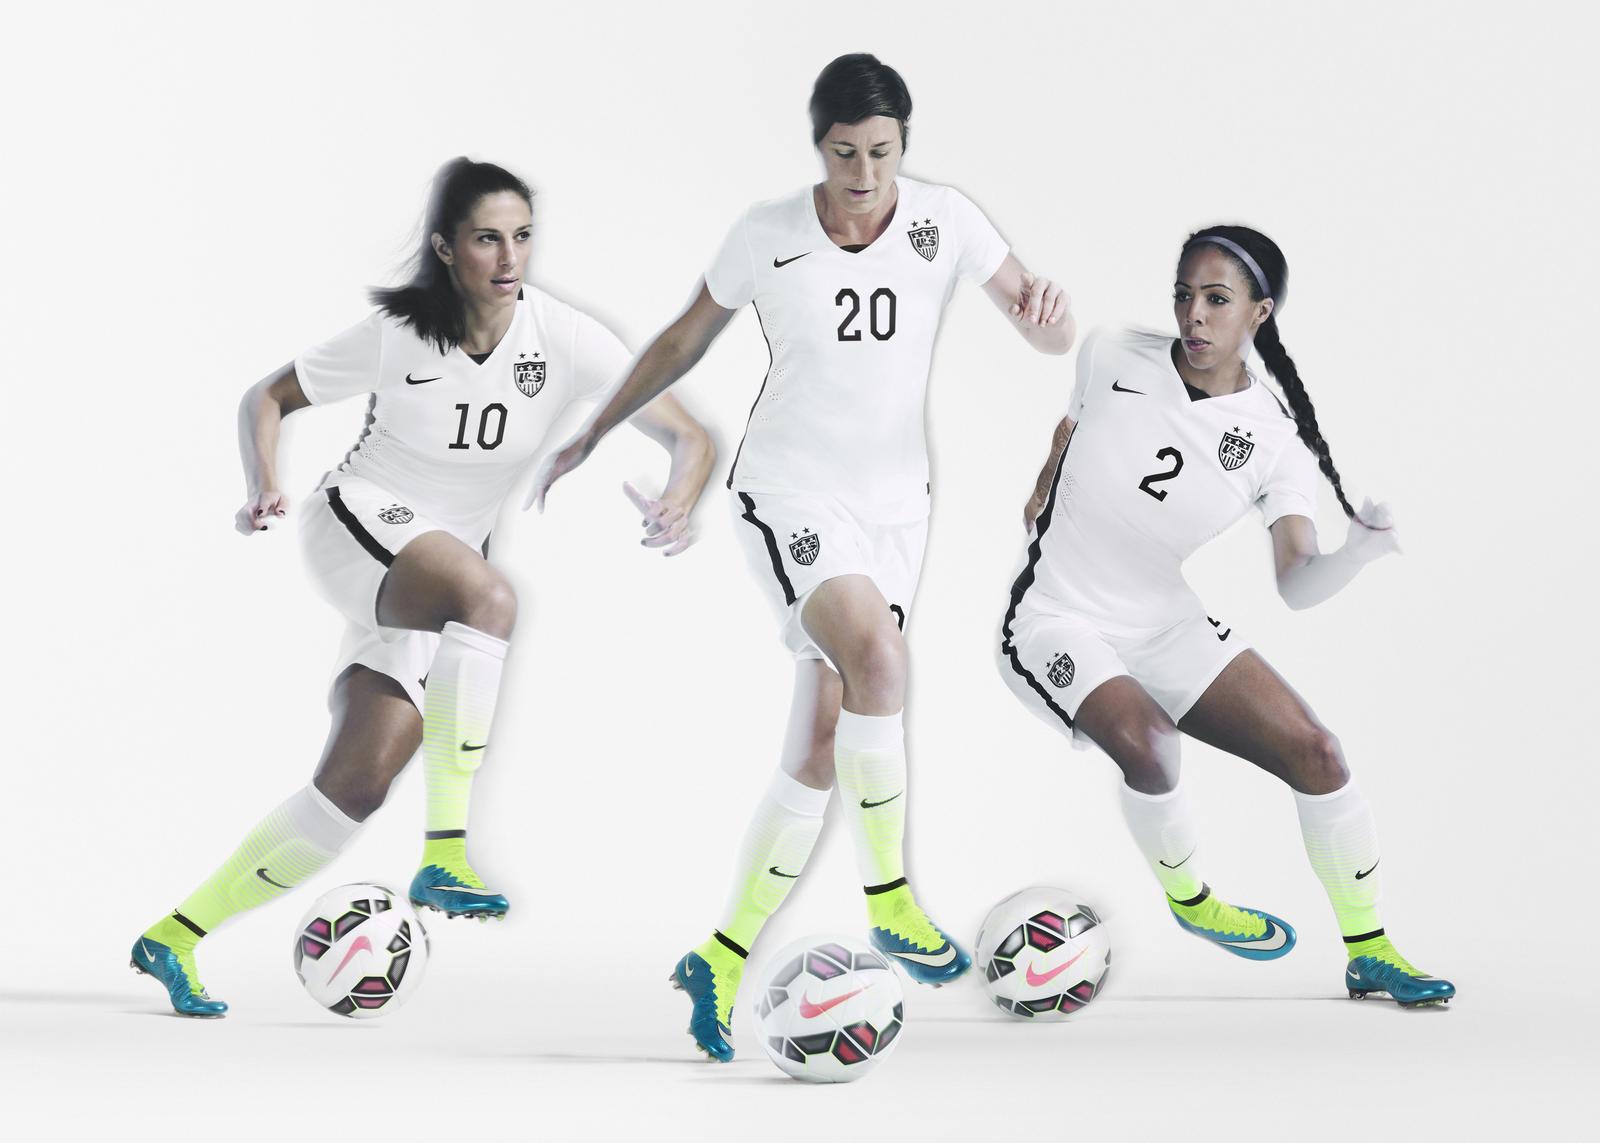 nike football home kit USA women world cup 2015